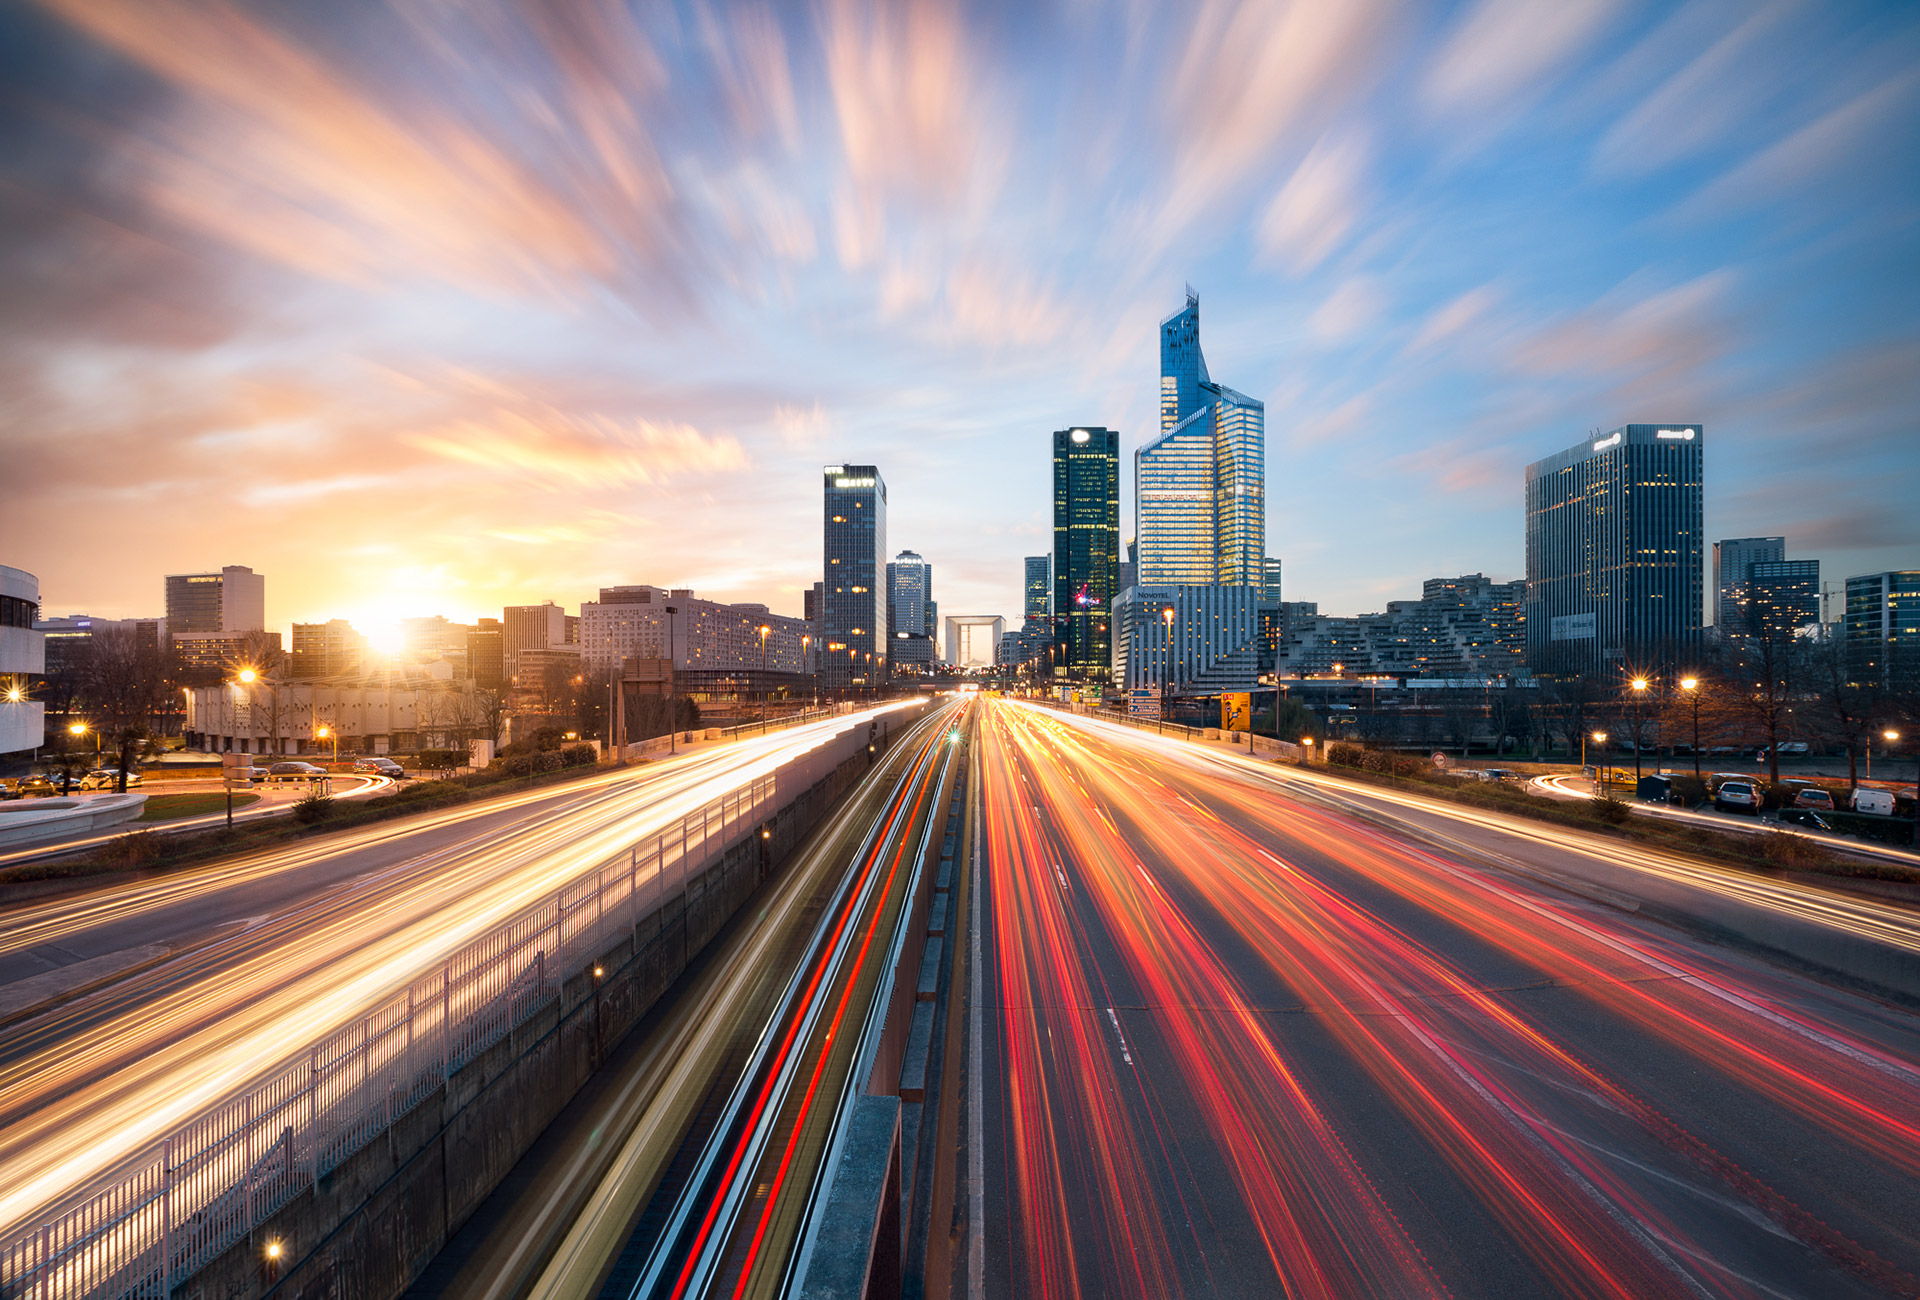 Digitally Transforming Cities Smarter Future